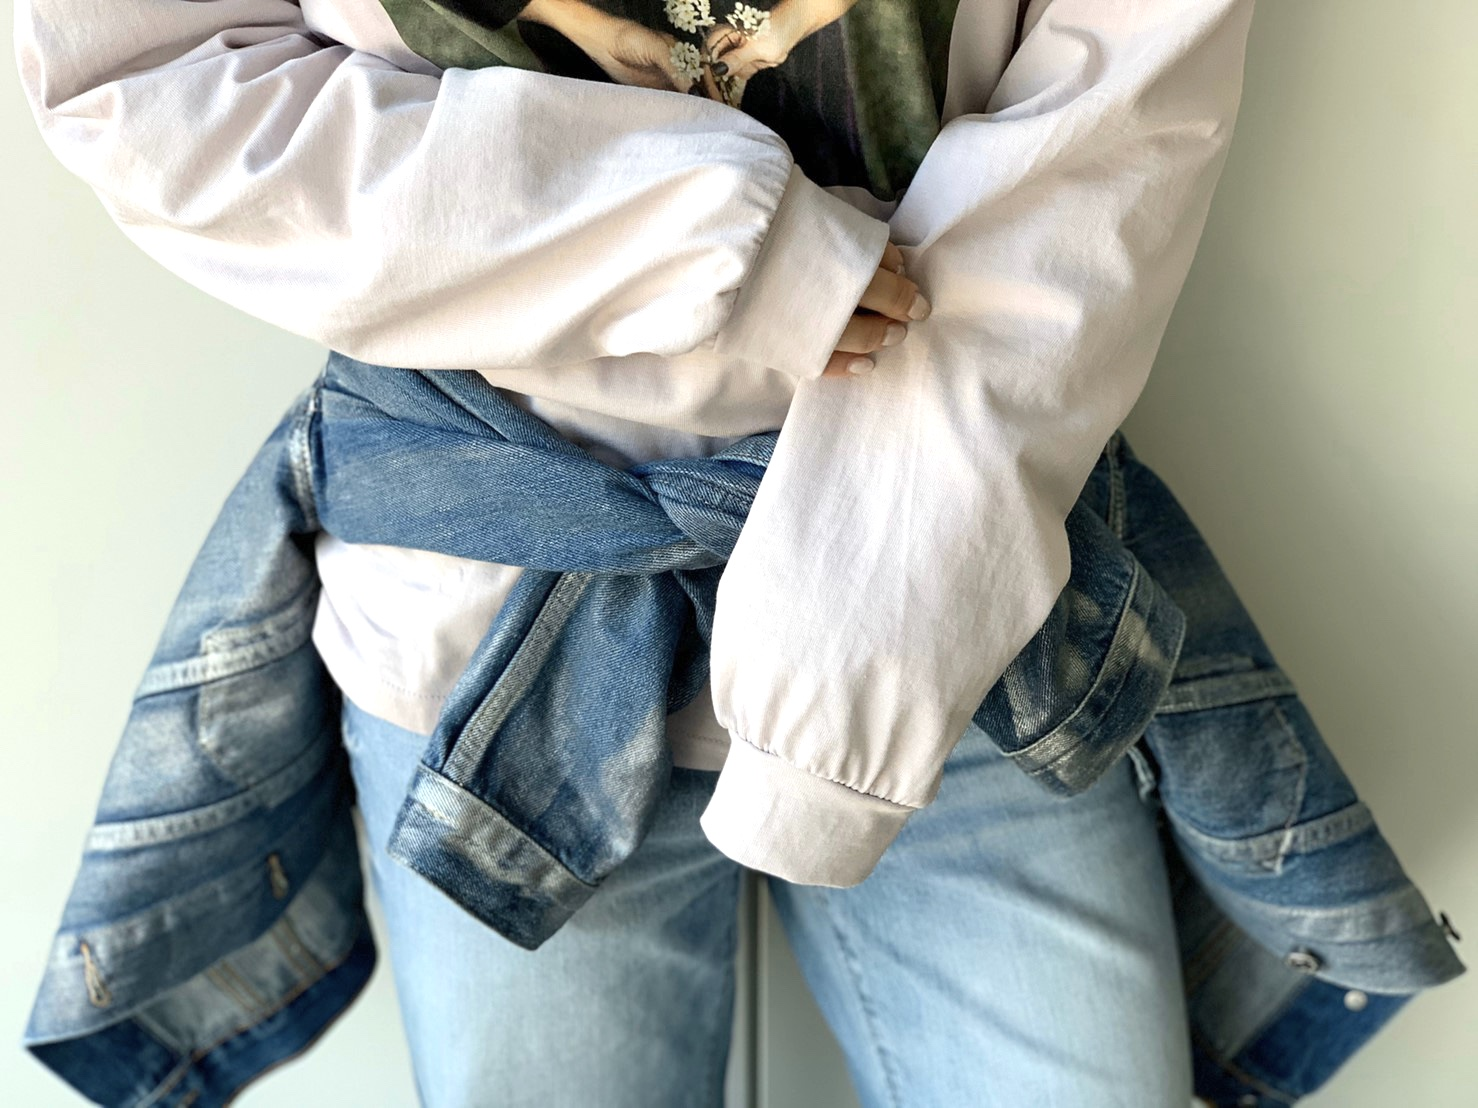 ScrapBook スクラップブック 有楽町 有楽町マルイ セレクトショップ オリジナルTシャツ プリントTシャツ ロンT 長袖 可愛い 着やすい